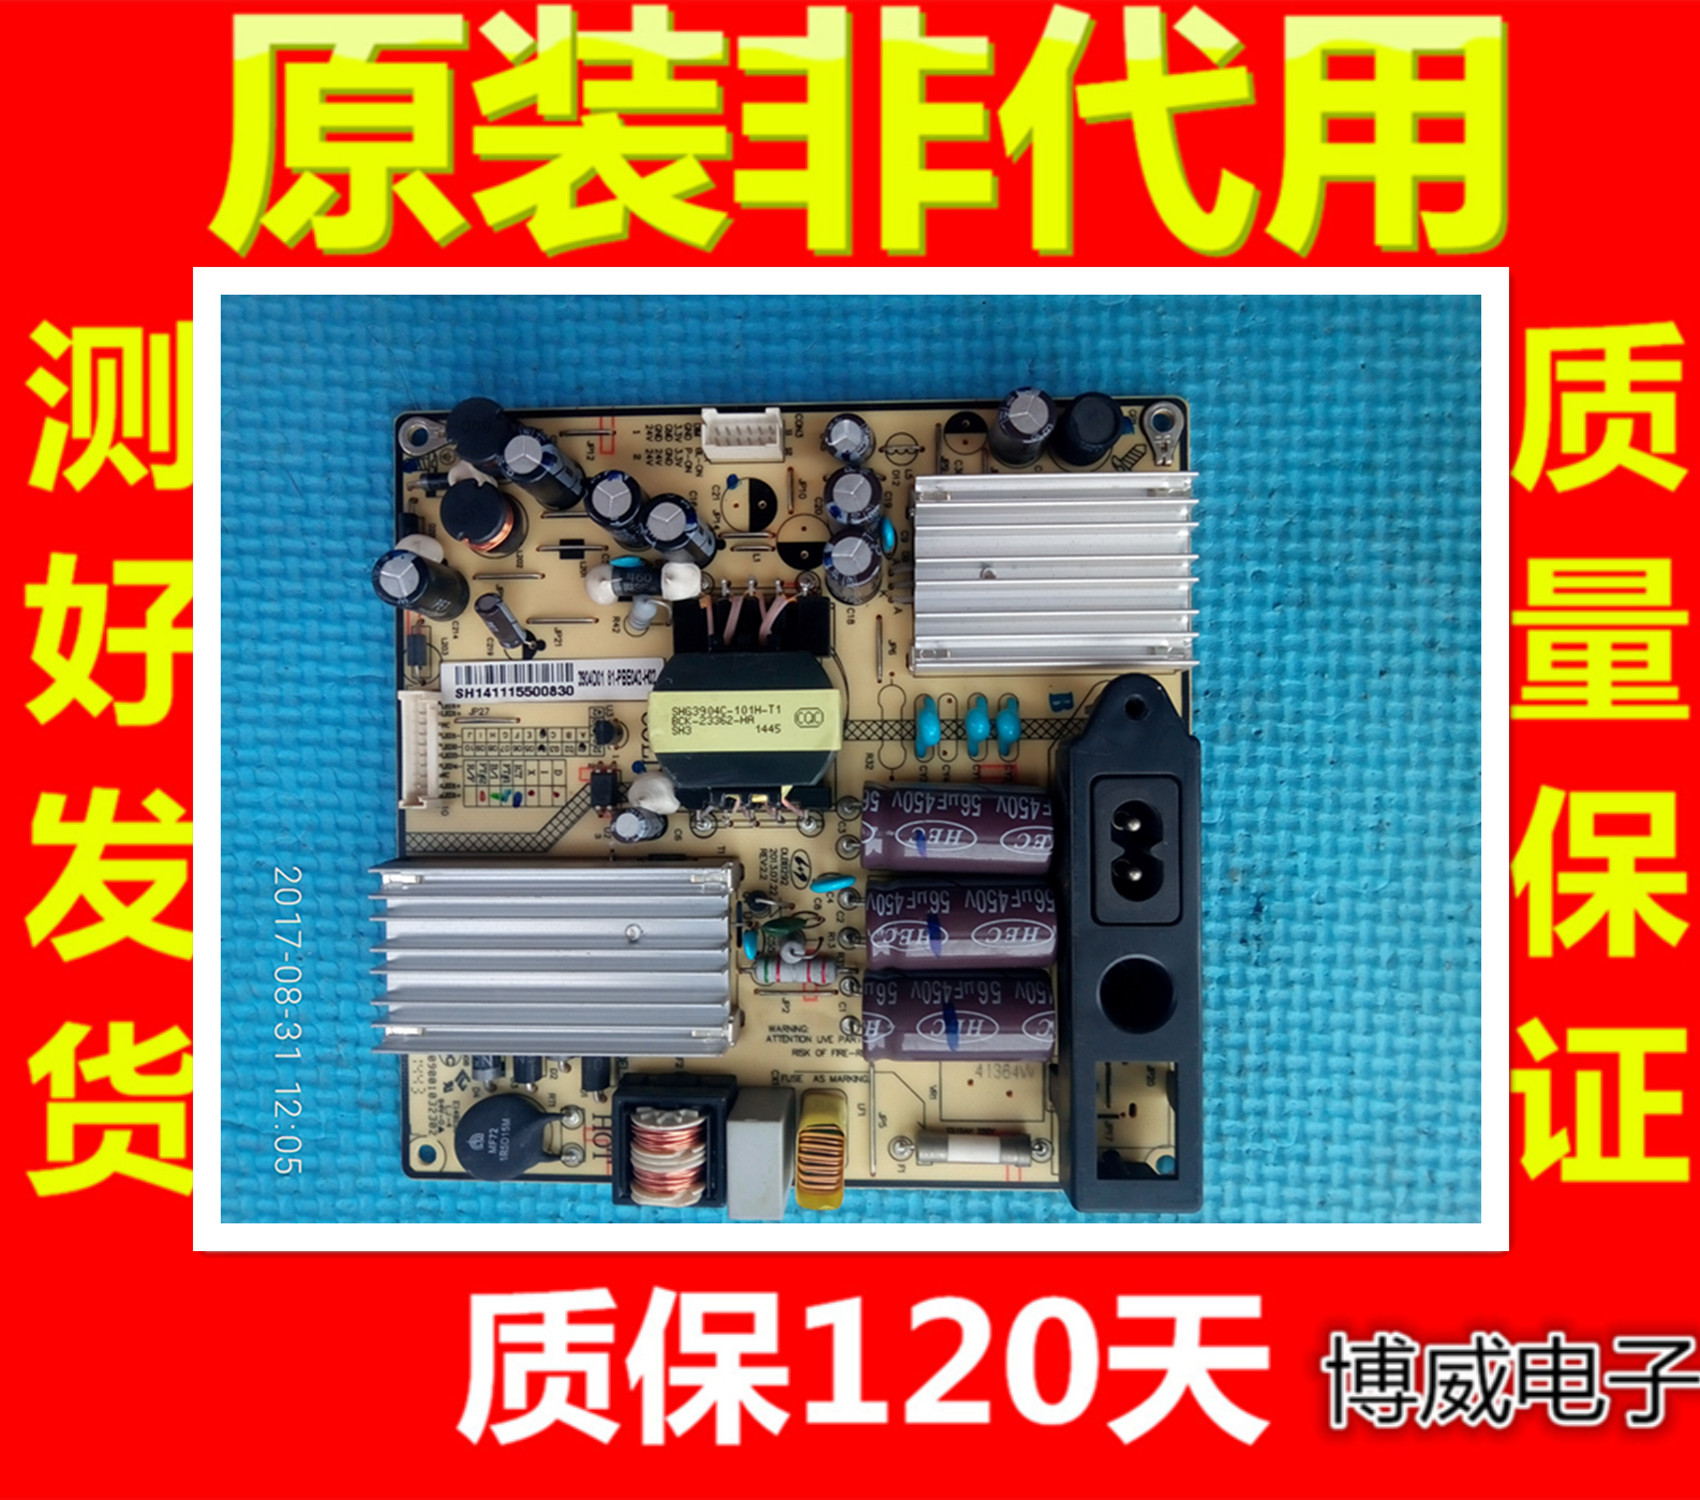 TCL TV LCD de 42 pulgadas L42F1590B paneles de energía SHG3904B-101H81-PBE039-PW4